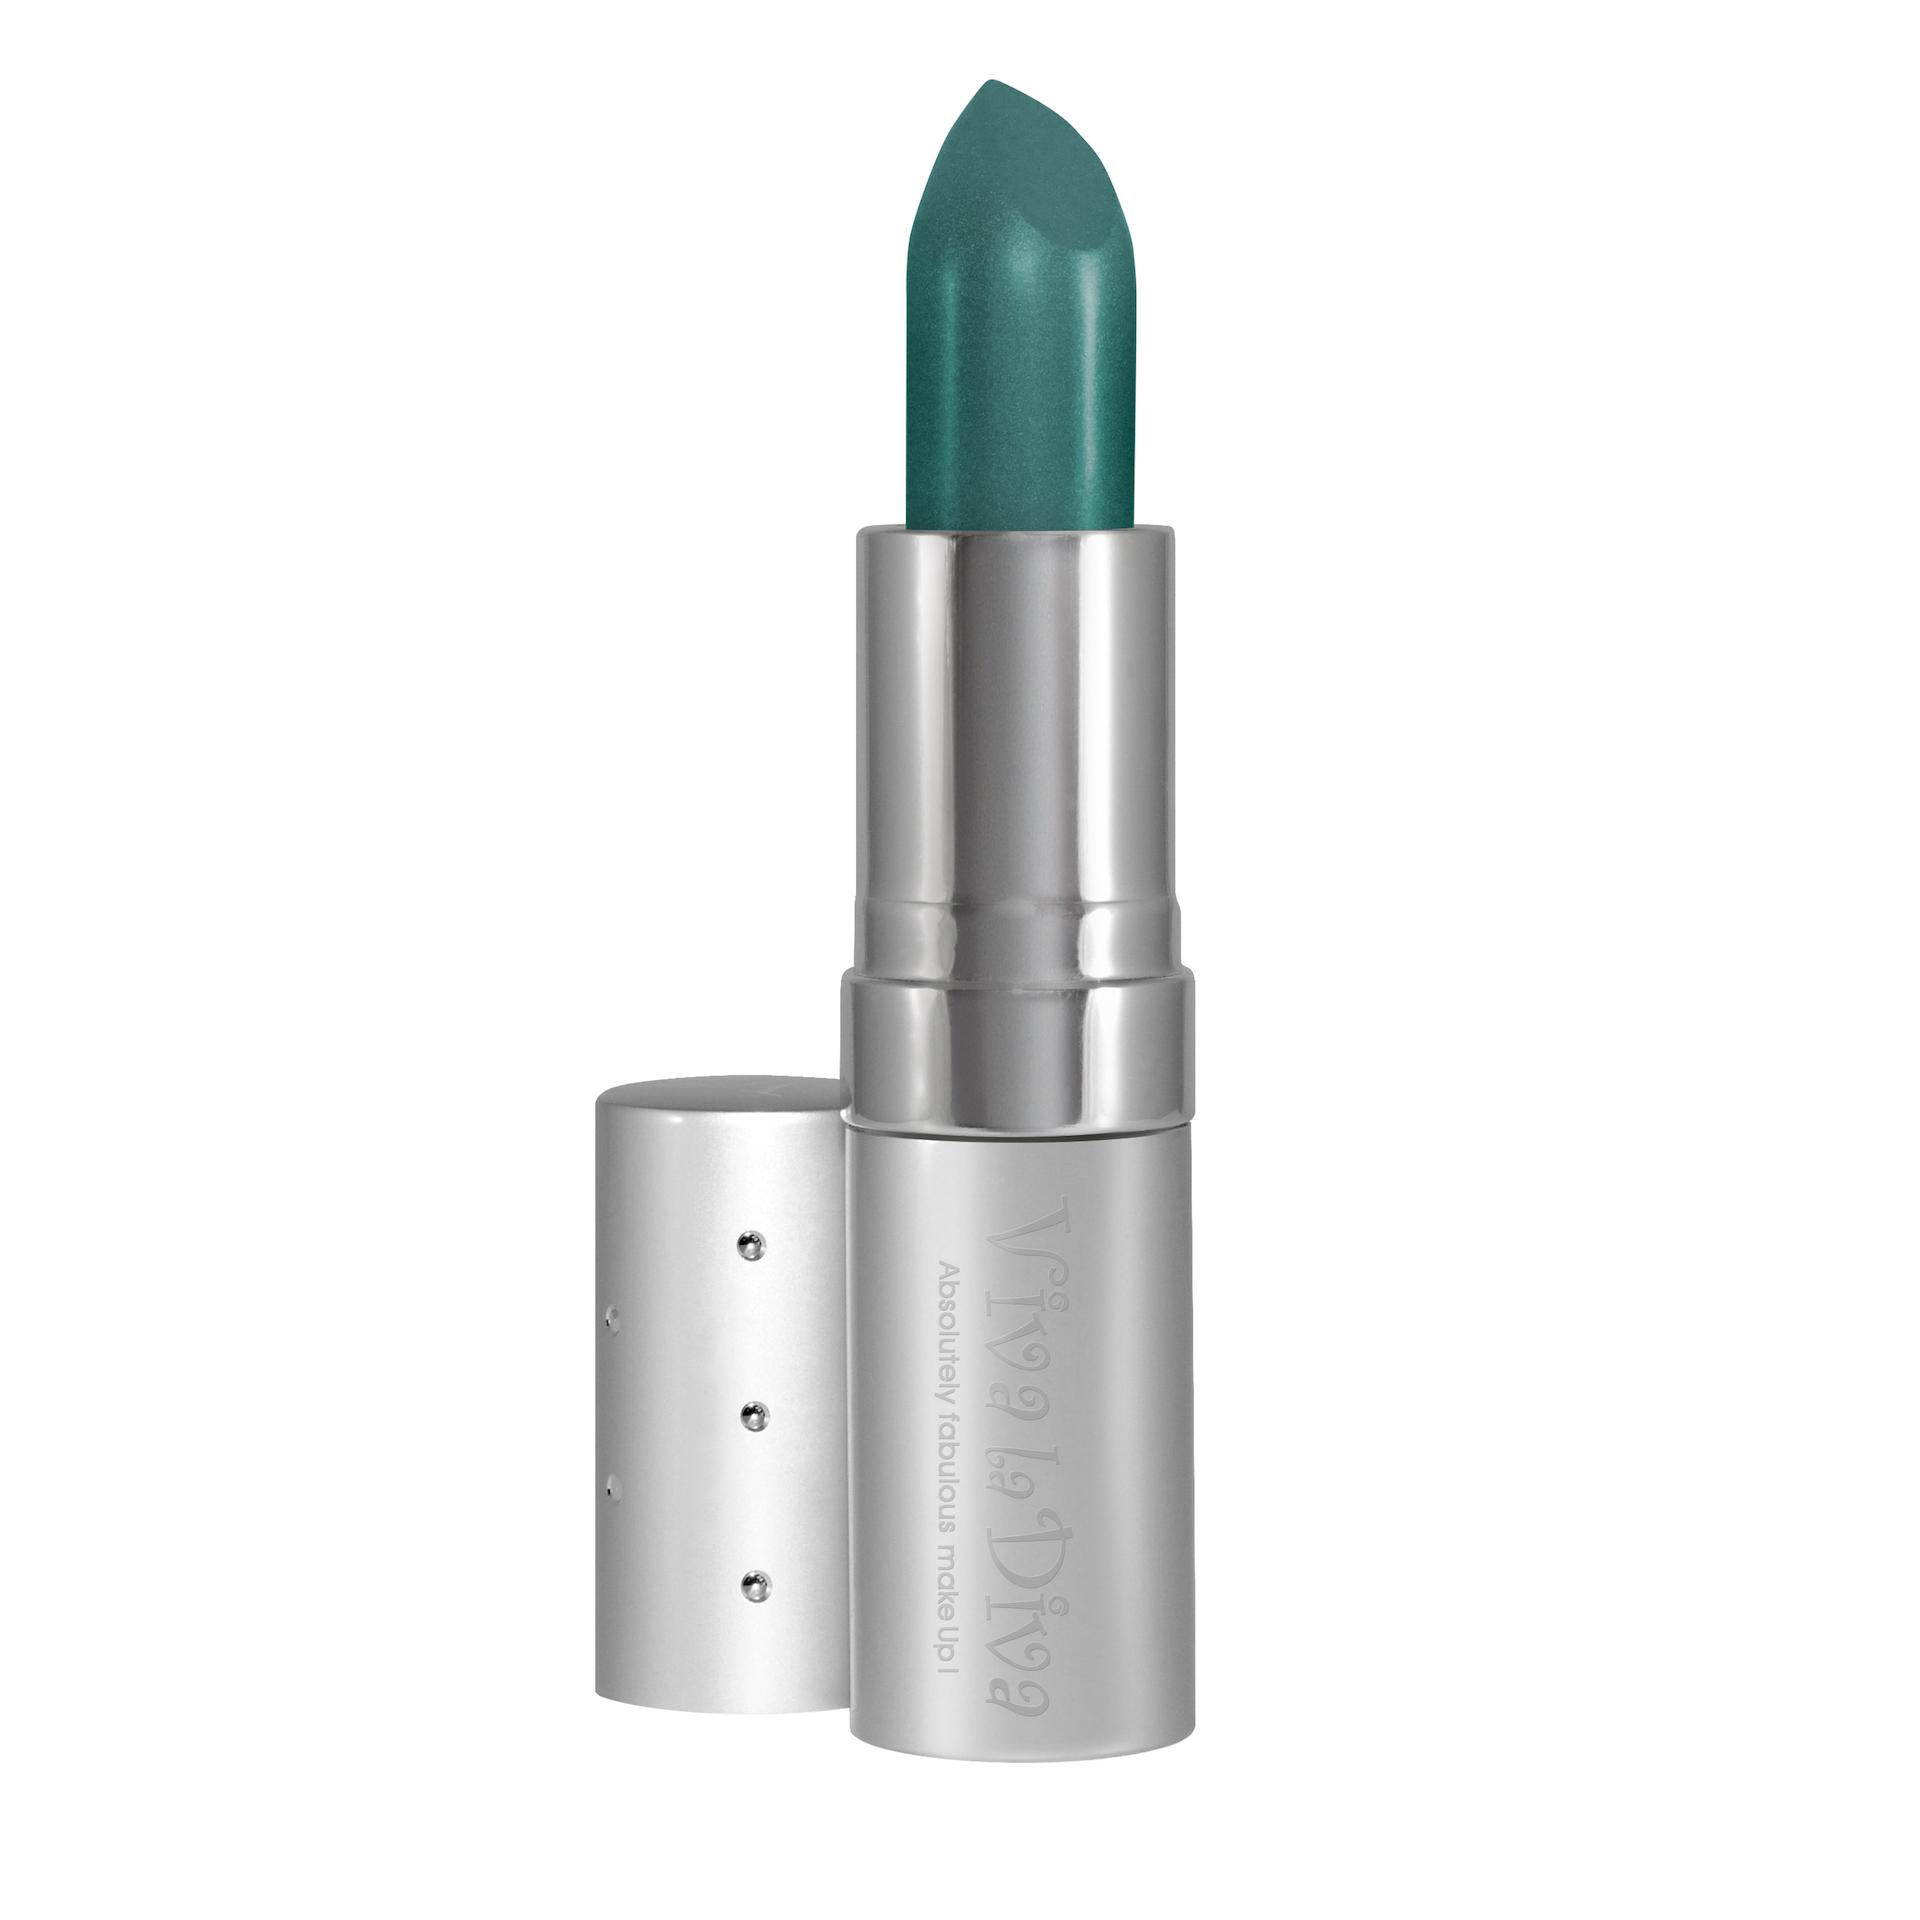 Lipstick no. 118Moonwalk